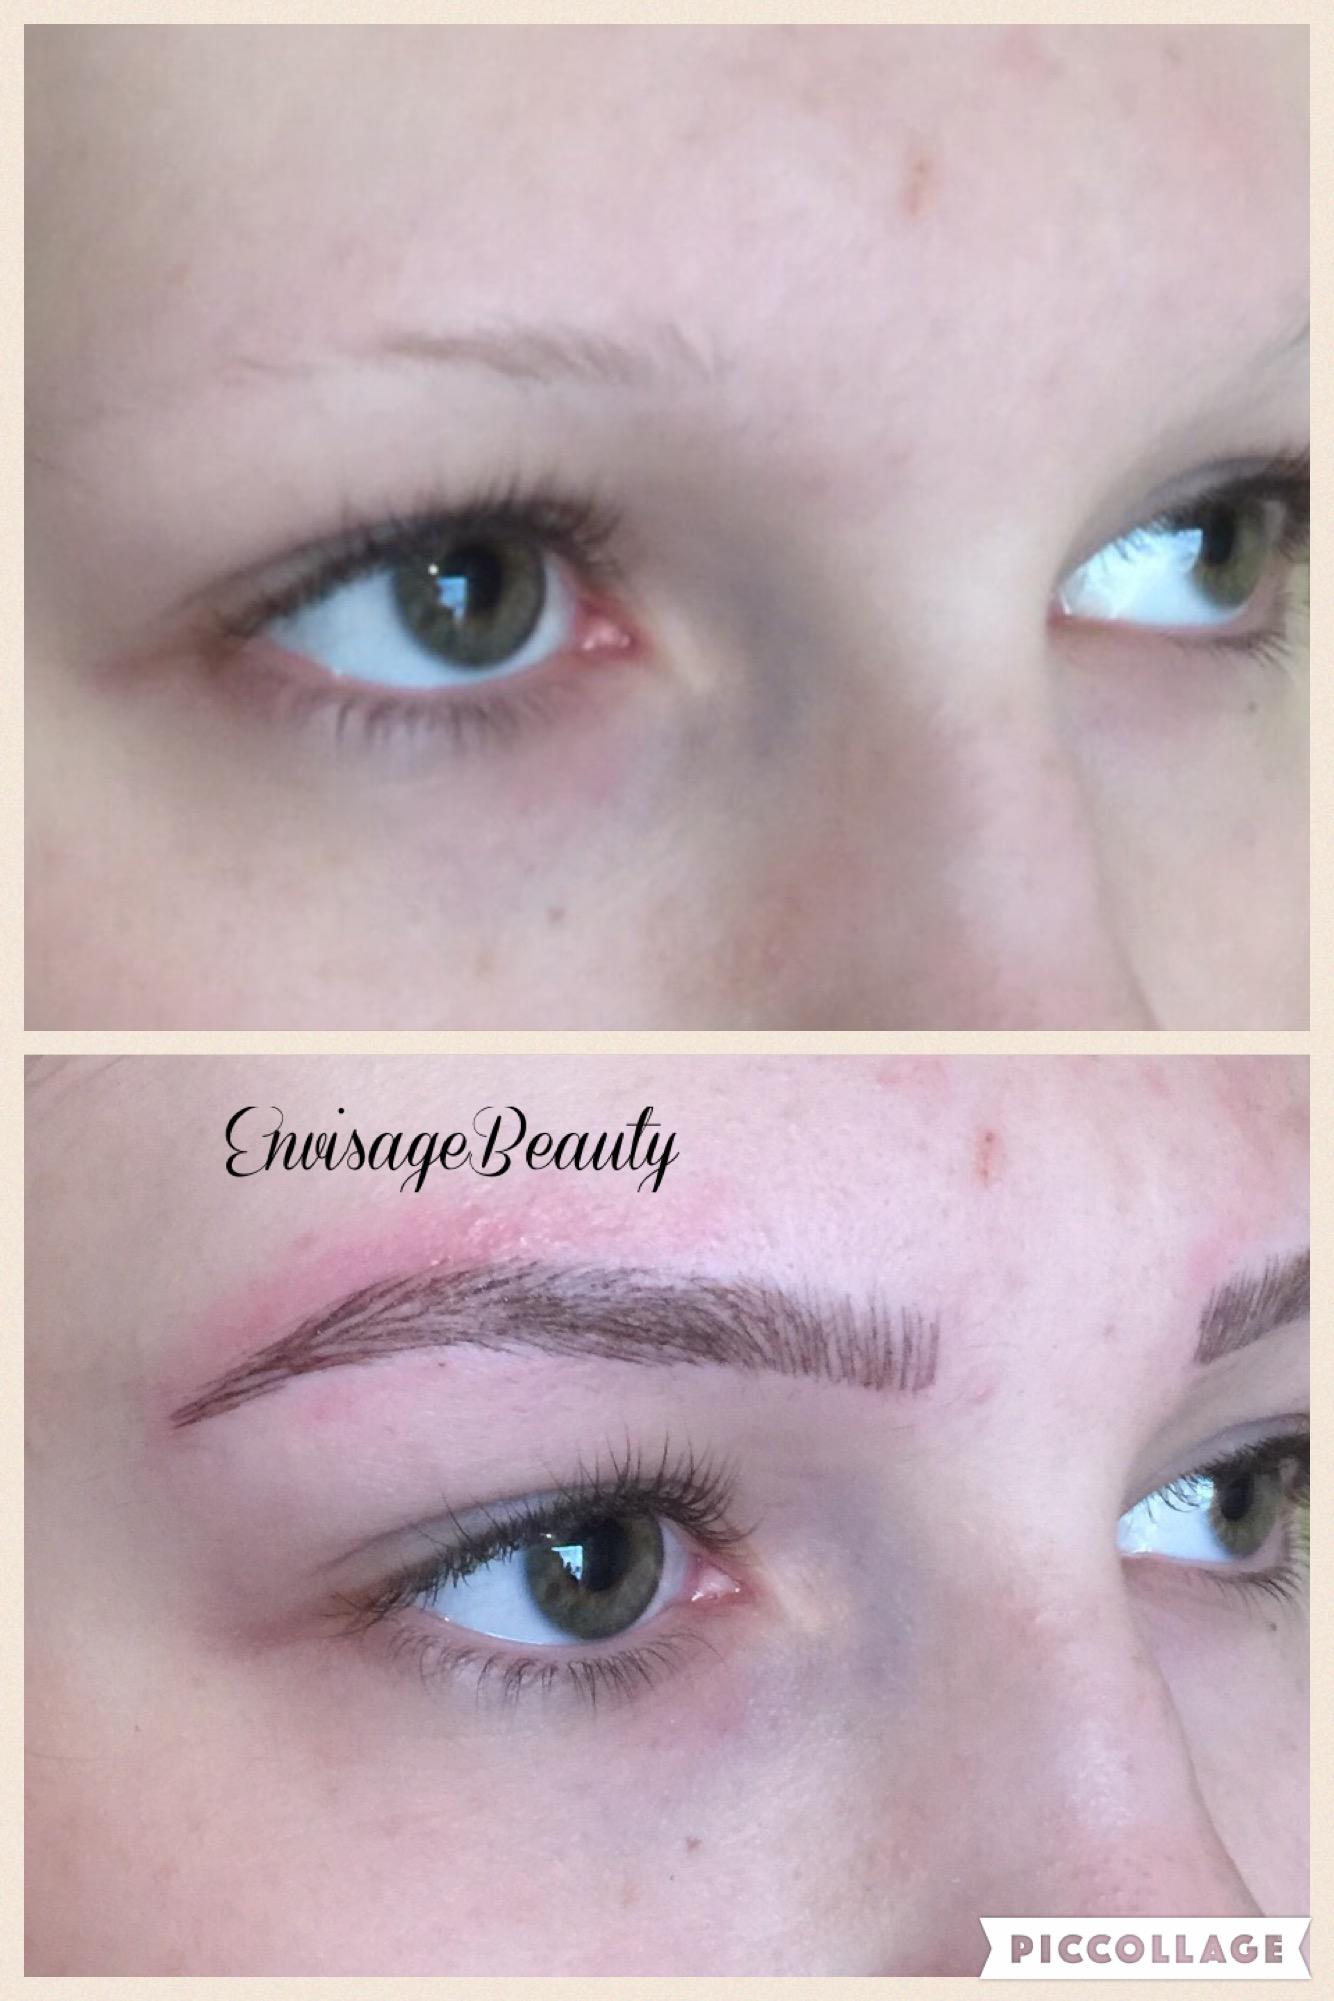 Eyebrow Tattoos | Envisage Beauty Ringwood North